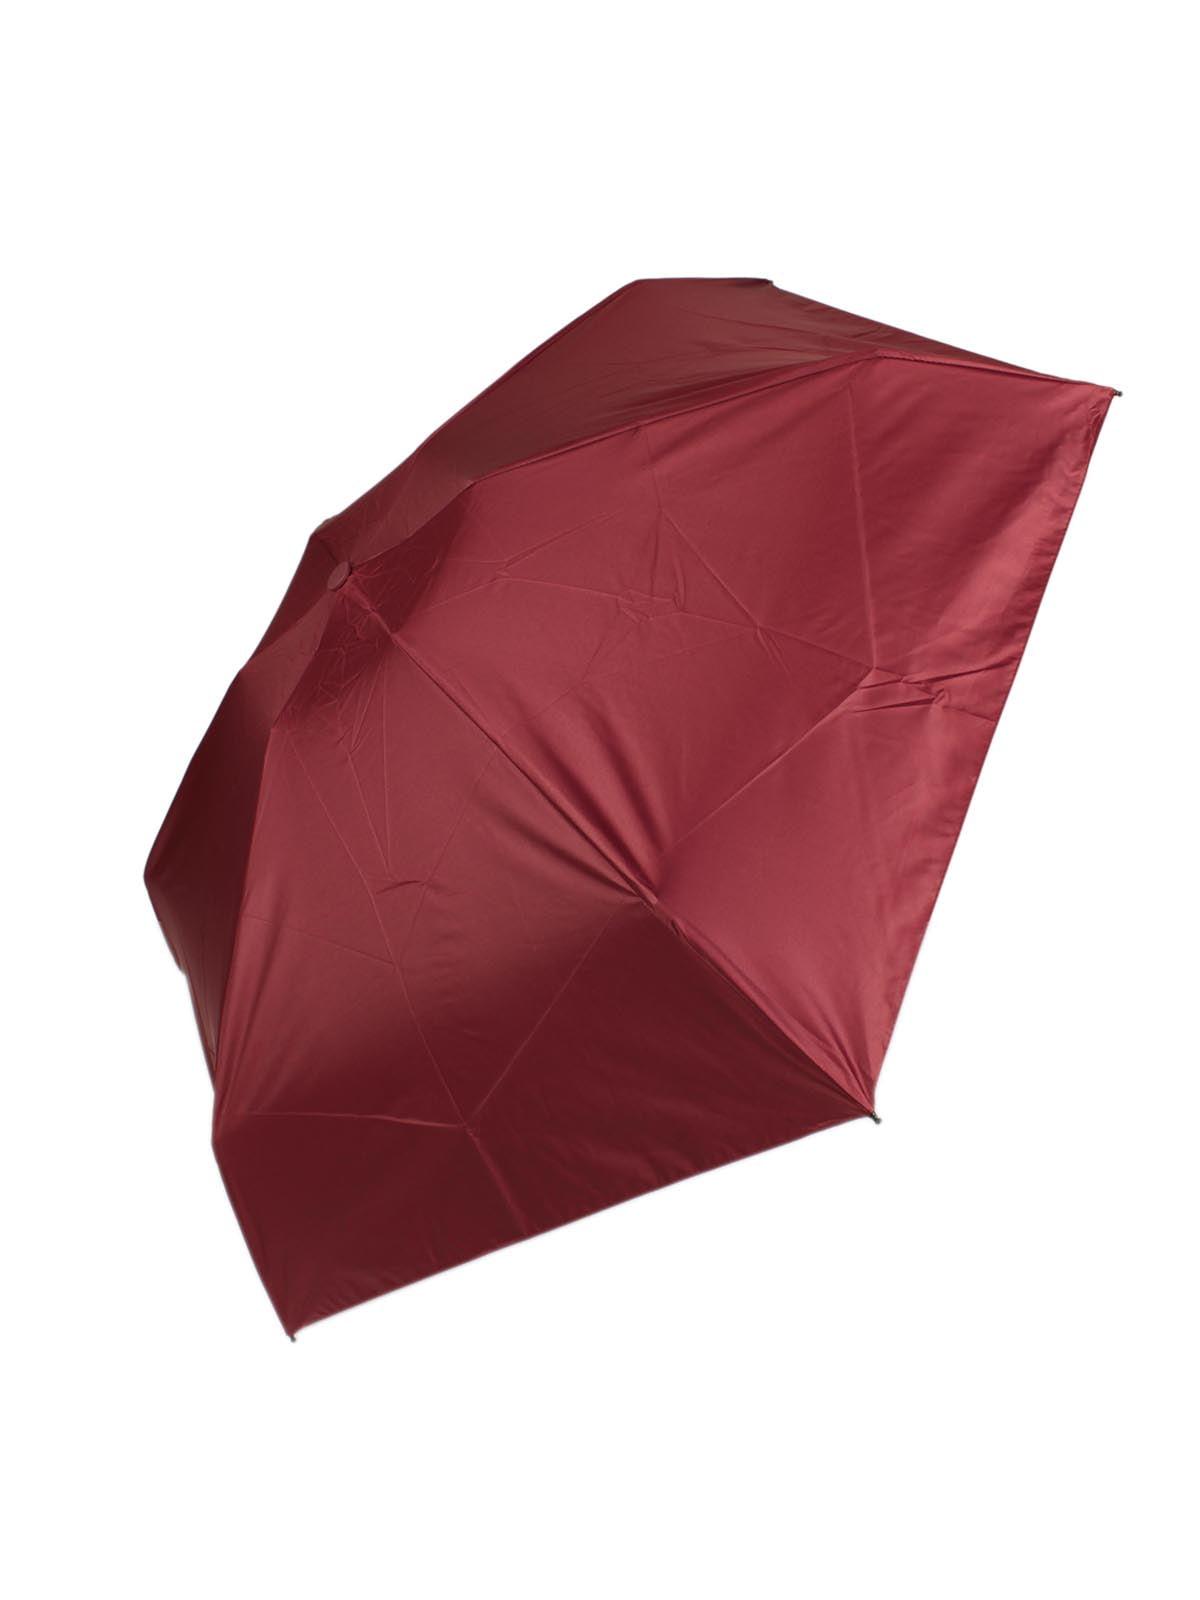 Зонт-полуавтомат   5343770